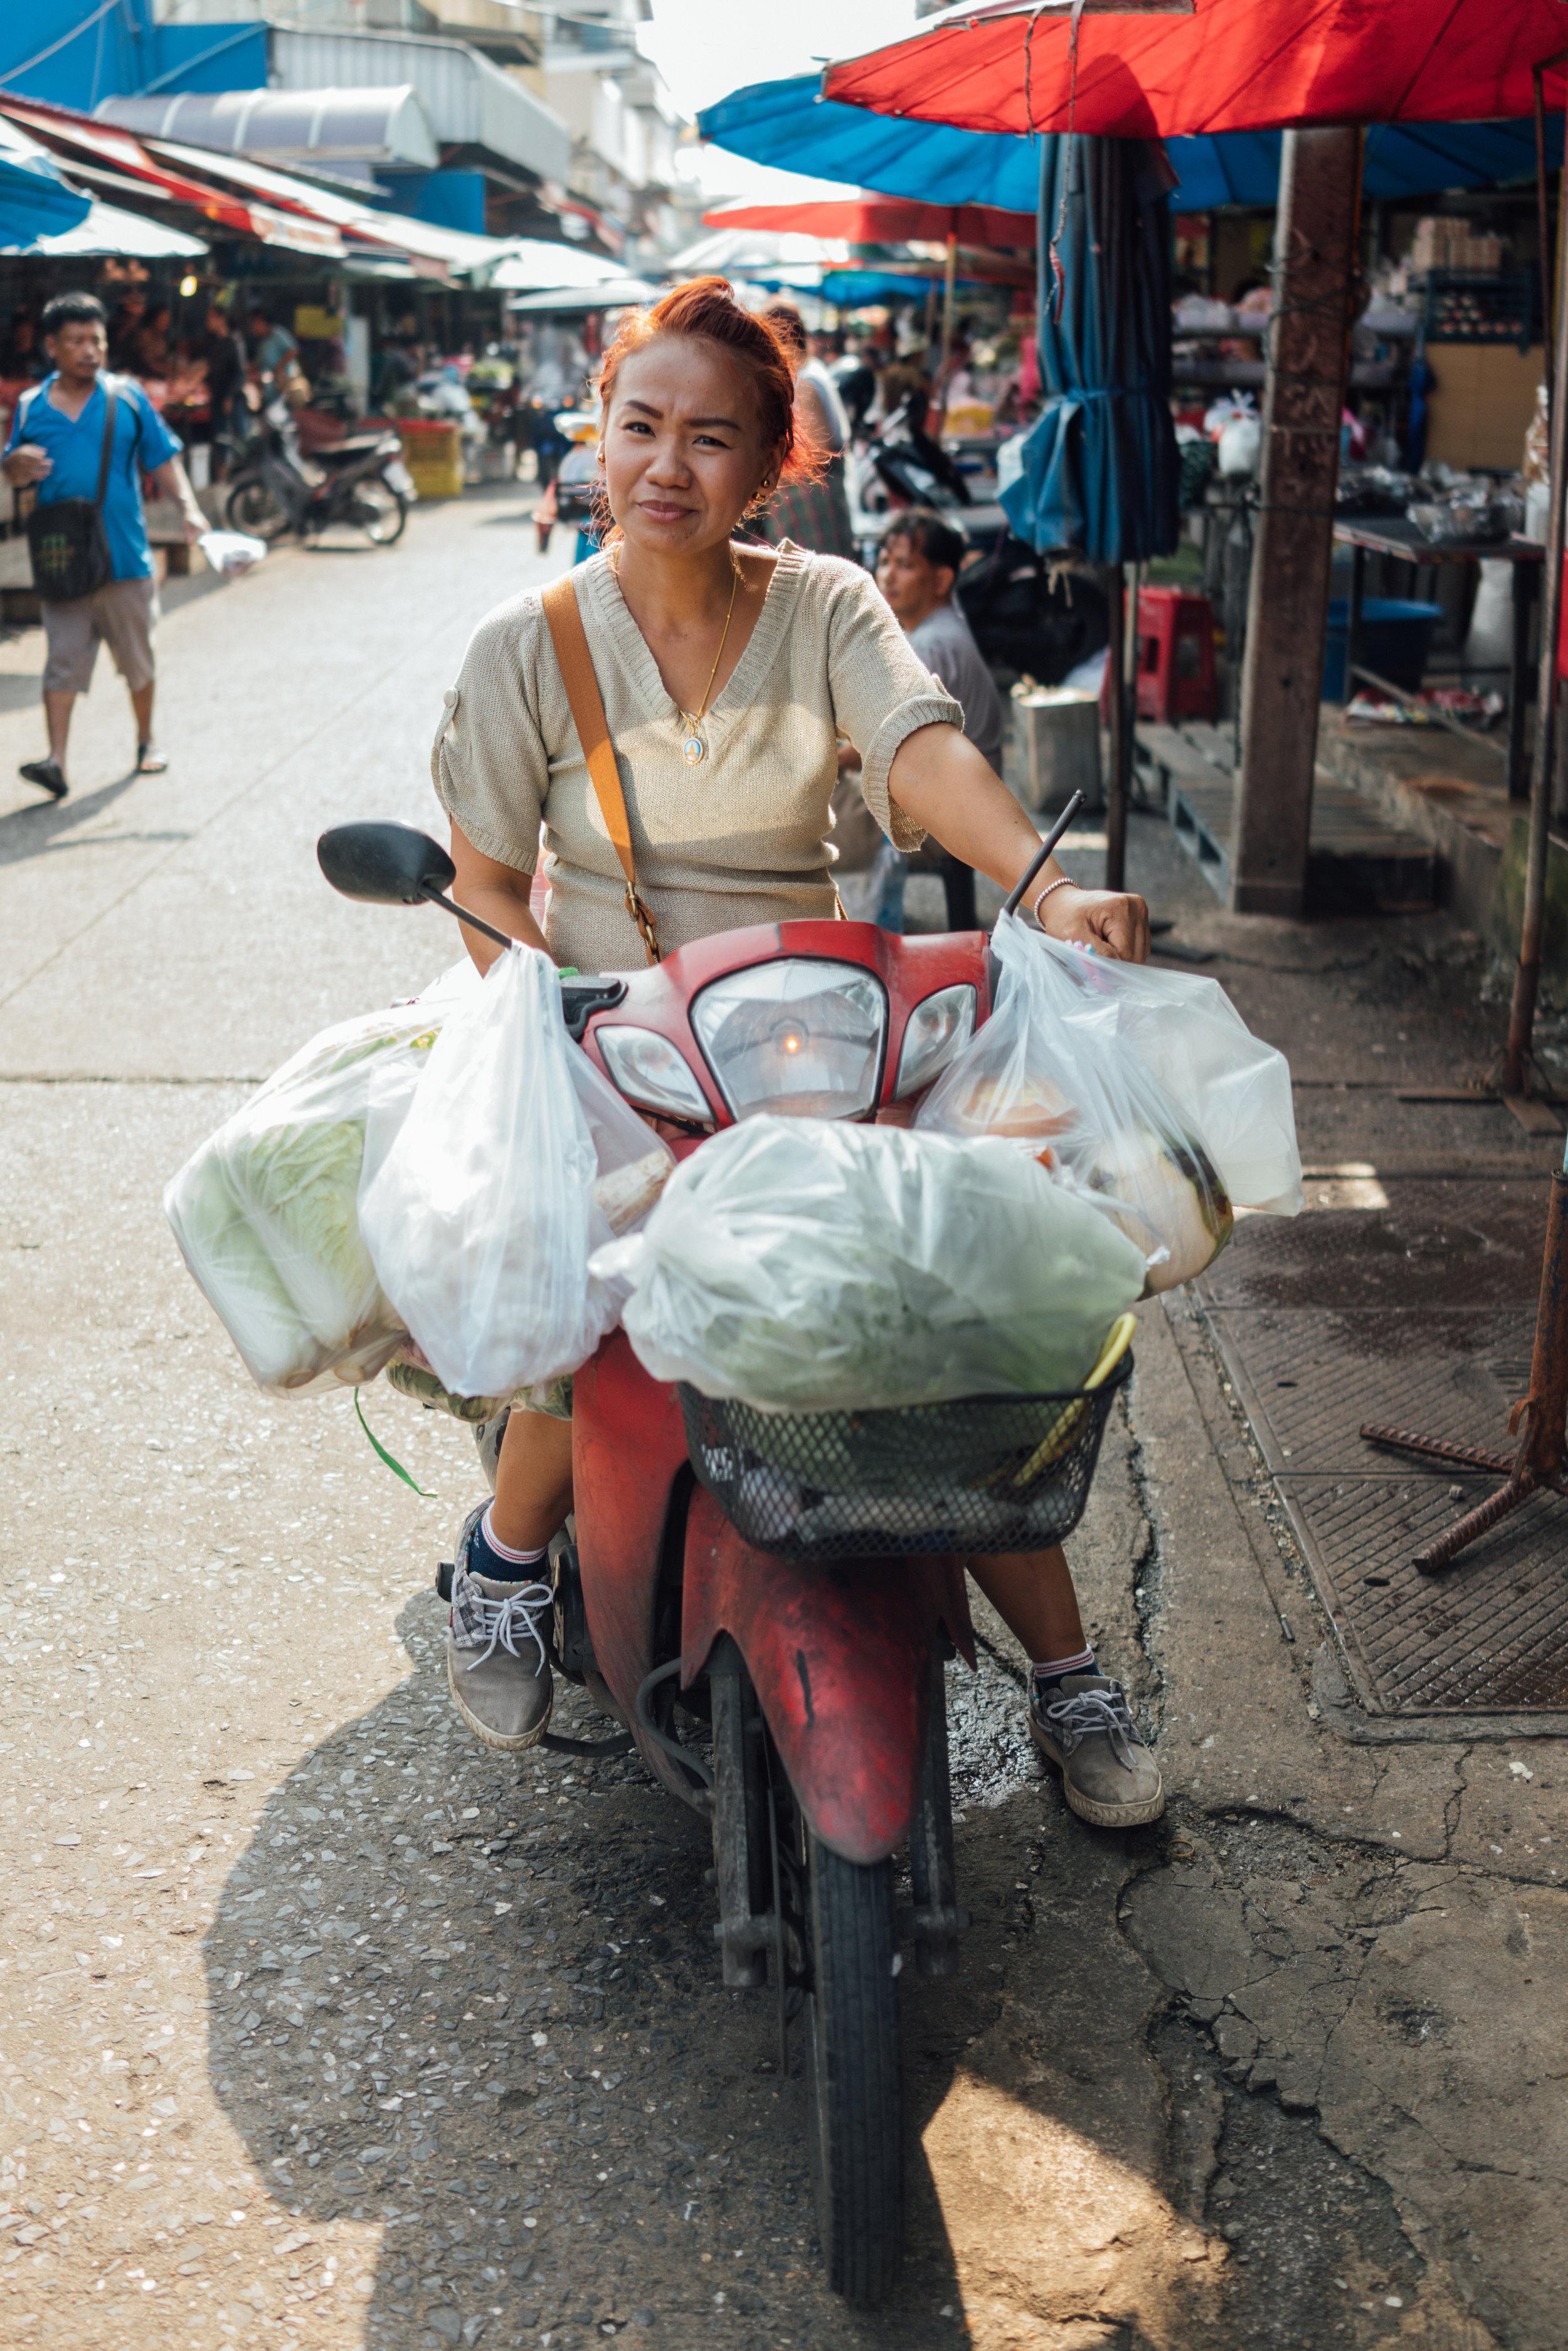 Stocking up at Muang Mai Market, a wholesale market